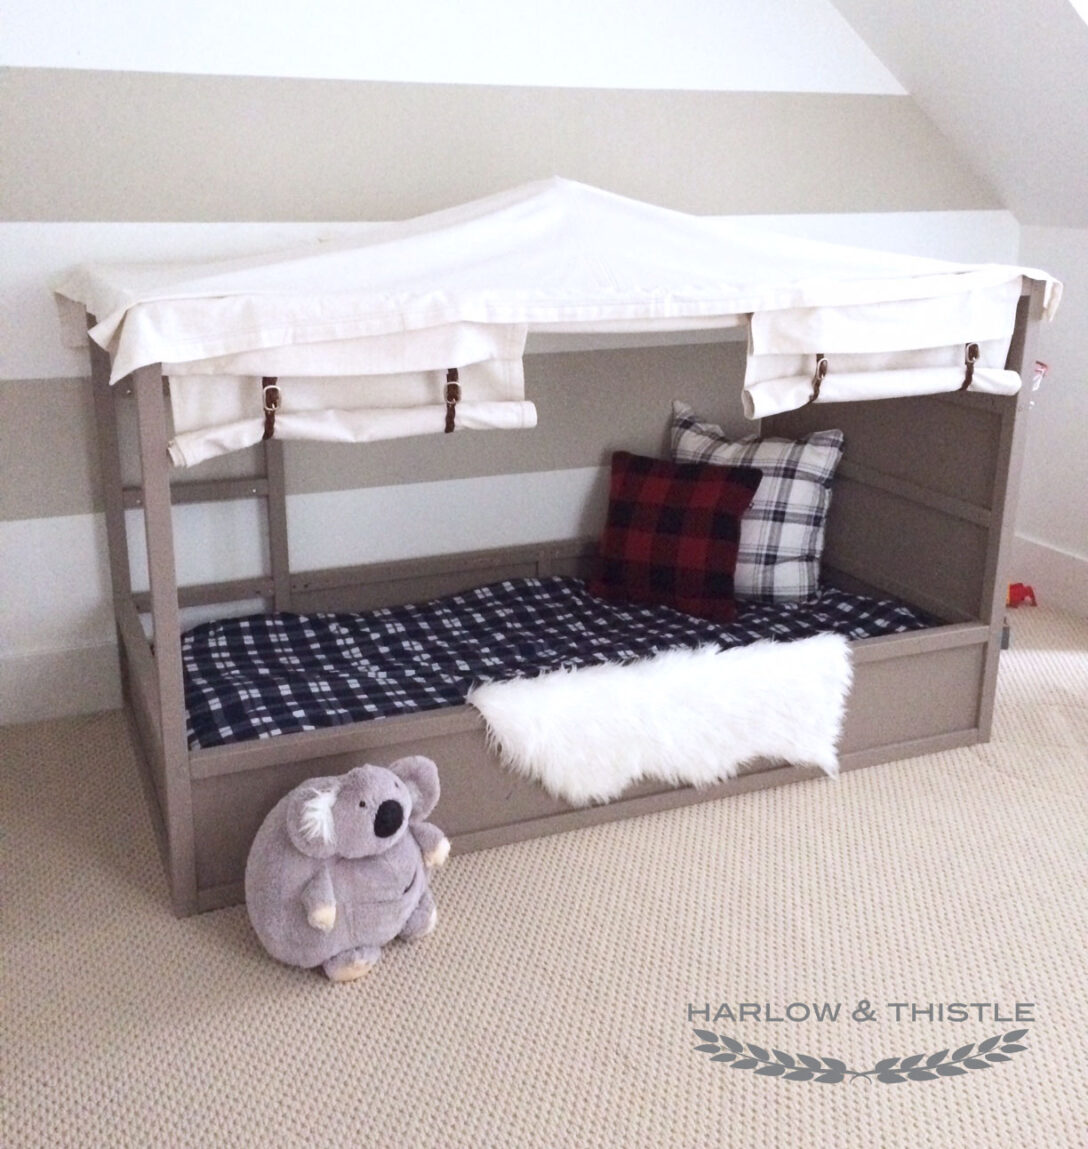 Large Size of Kura Hack Ikea Bed Diy Boy Canopy Harlow Thistle Home Wohnzimmer Kura Hack